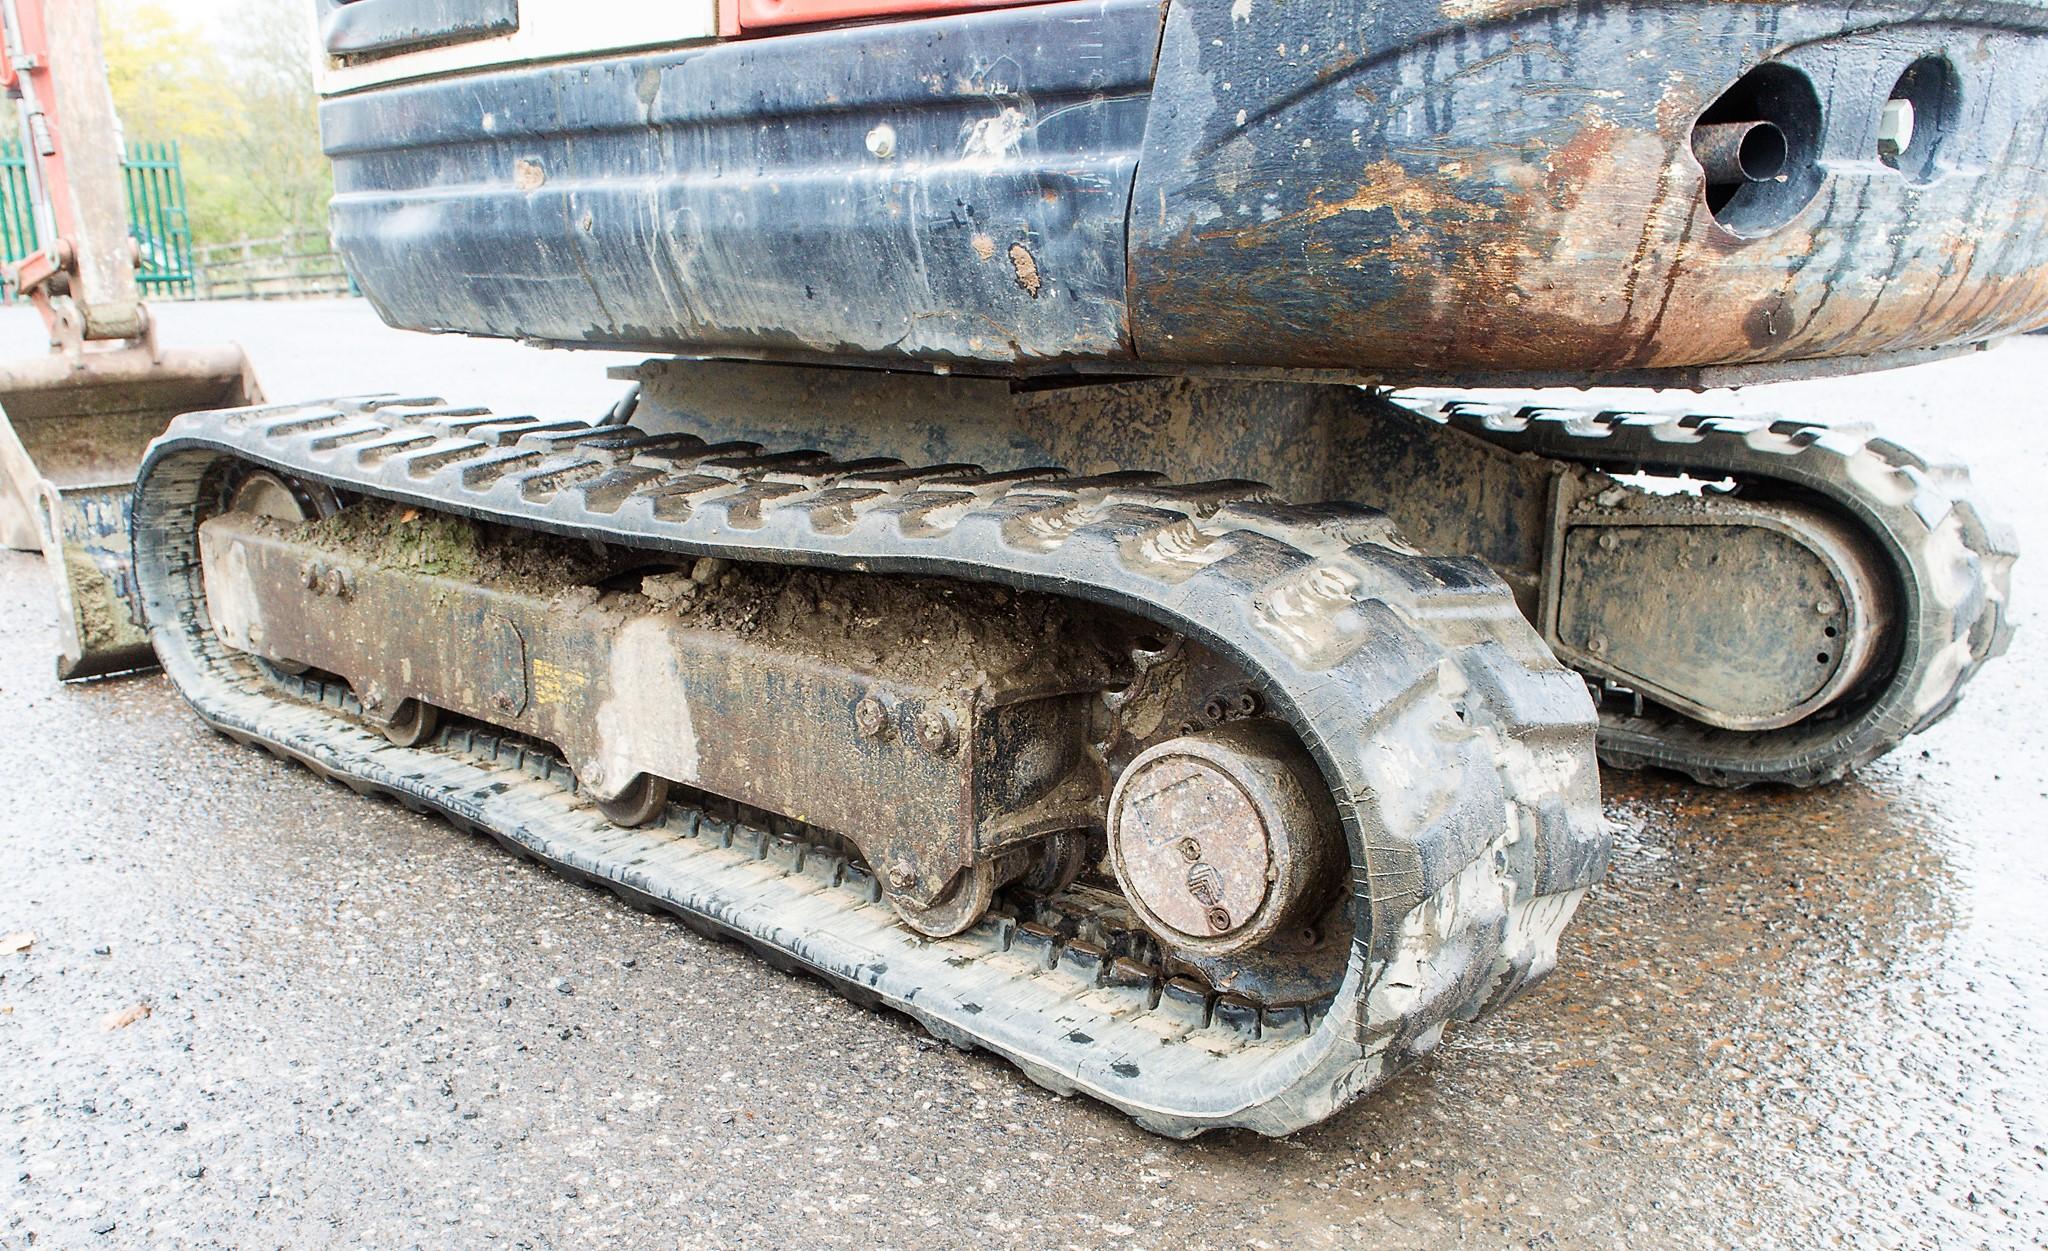 Lot 12 - Kubota KX61-3 2.5 tonne rubber tracked mini excavator Year: 2012 S/N: 79211 Recorded Hours: 3061